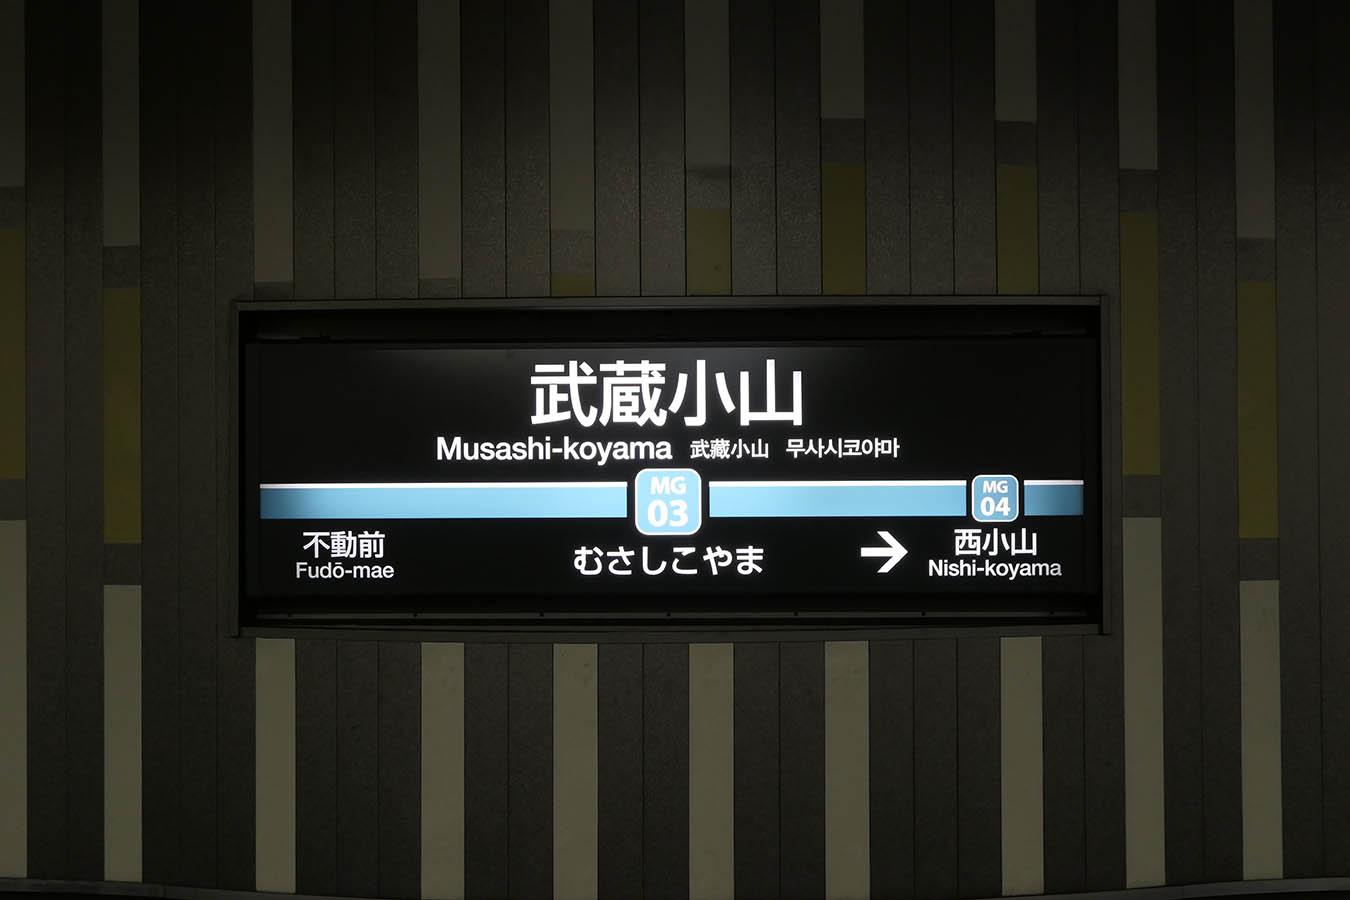 MG03_photo06.jpg